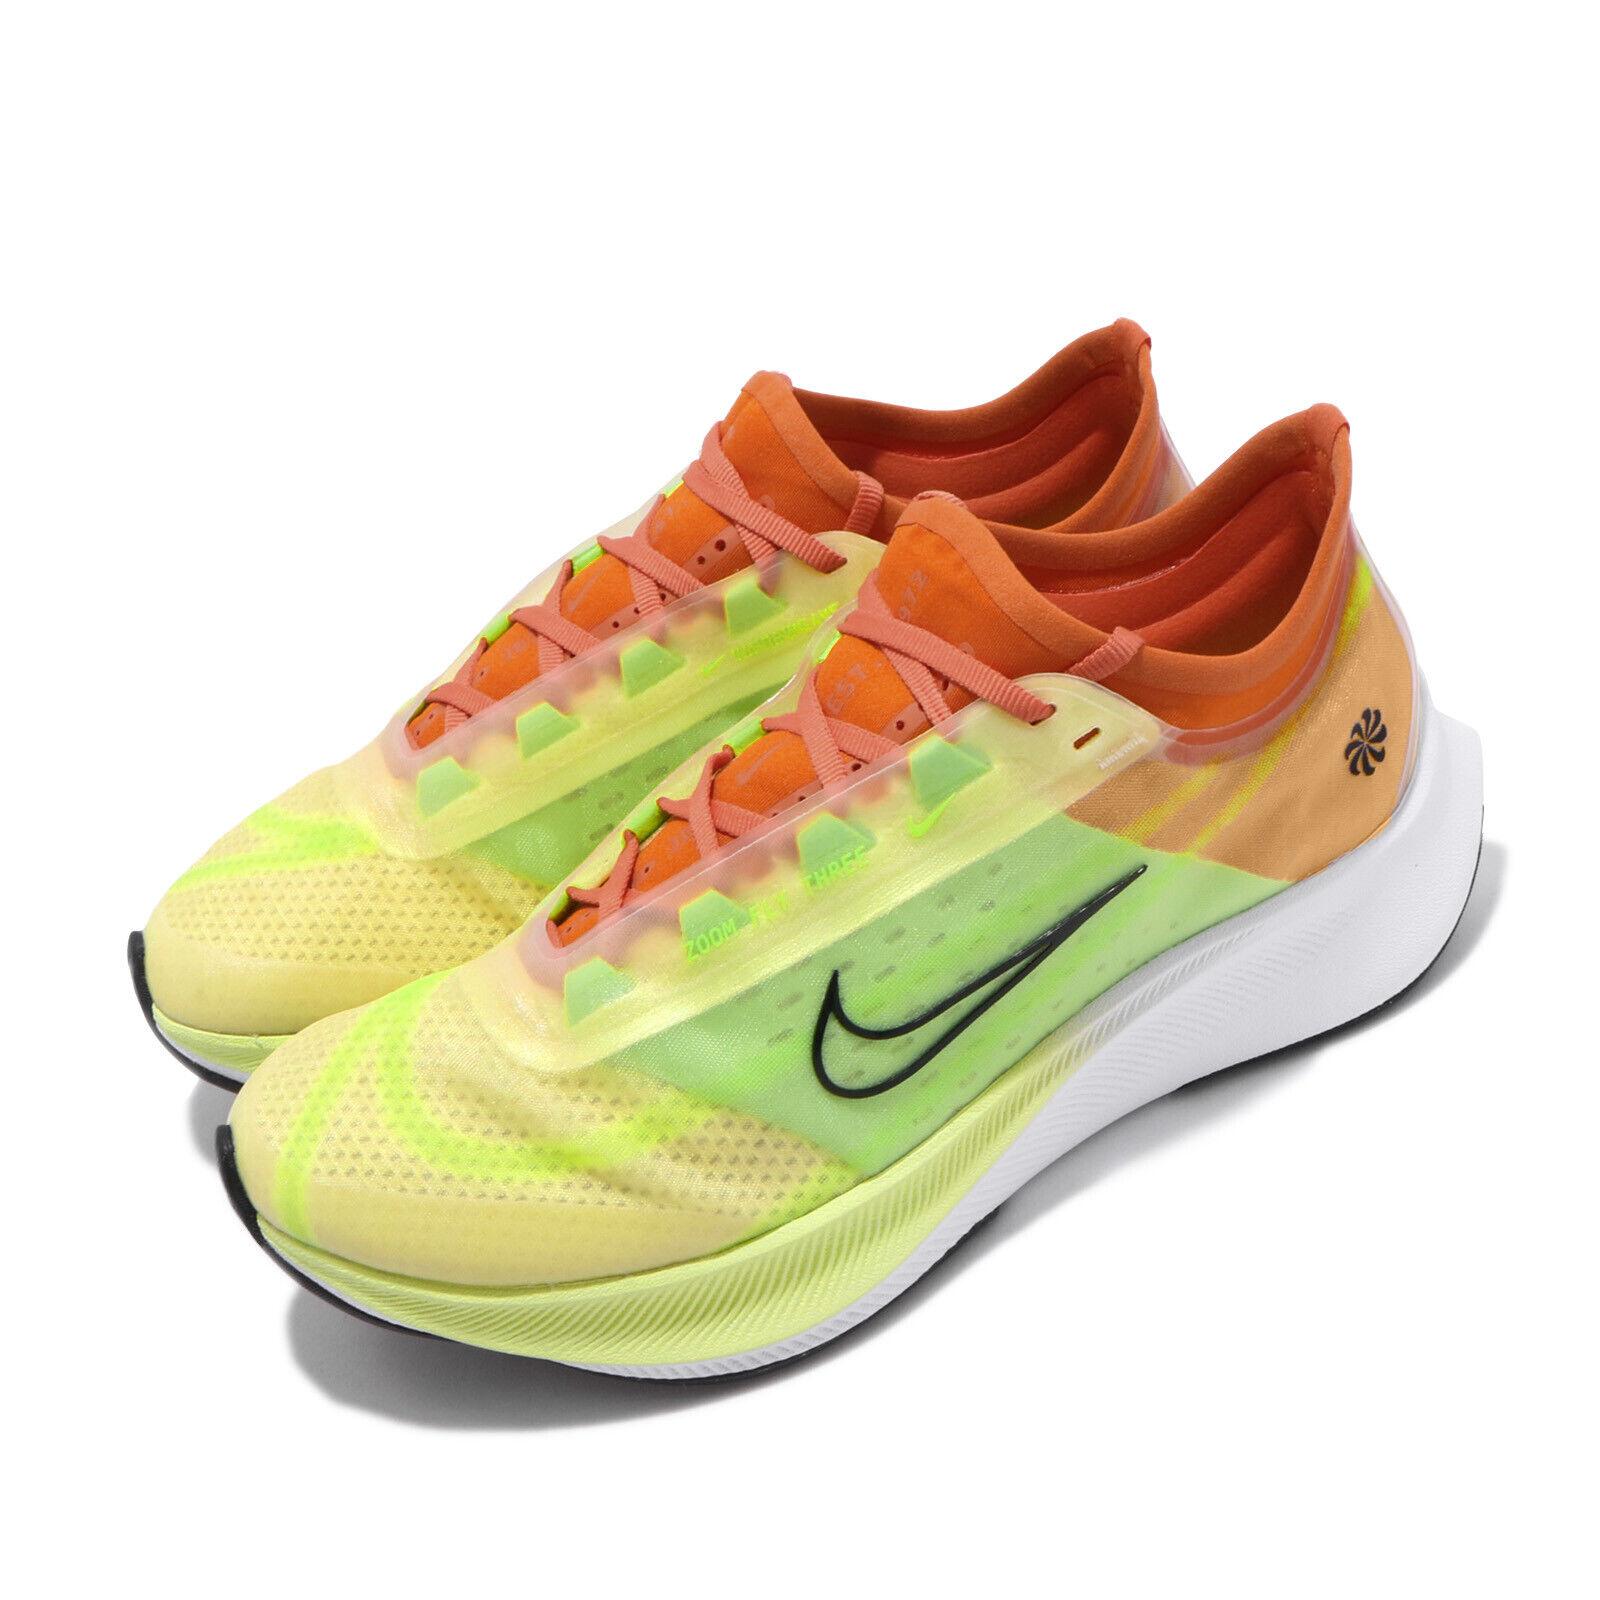 Nike Wmns Zoom Fly 3 Rise Luminous Green Starfish Women Running shoes CQ4483-300